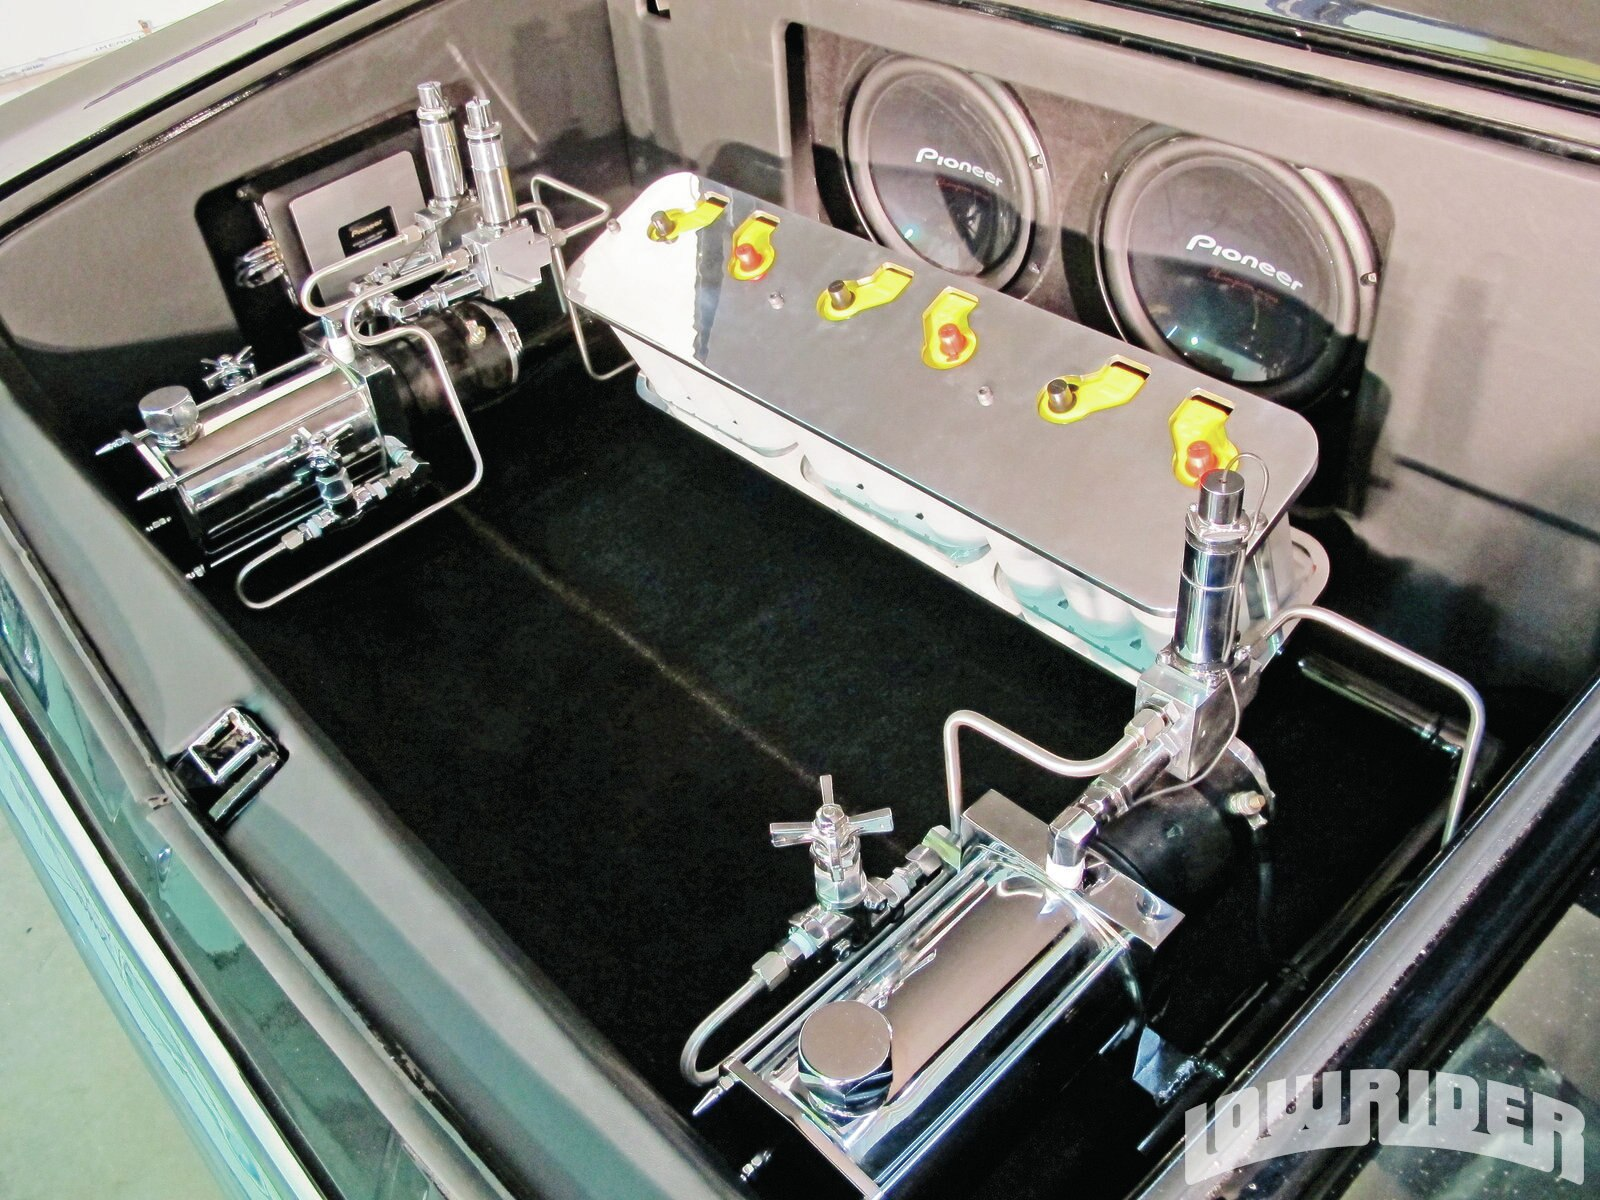 1203-lrmp-26-o-pioneer-equipment-trunk-compartment-custom-trunk-setup1